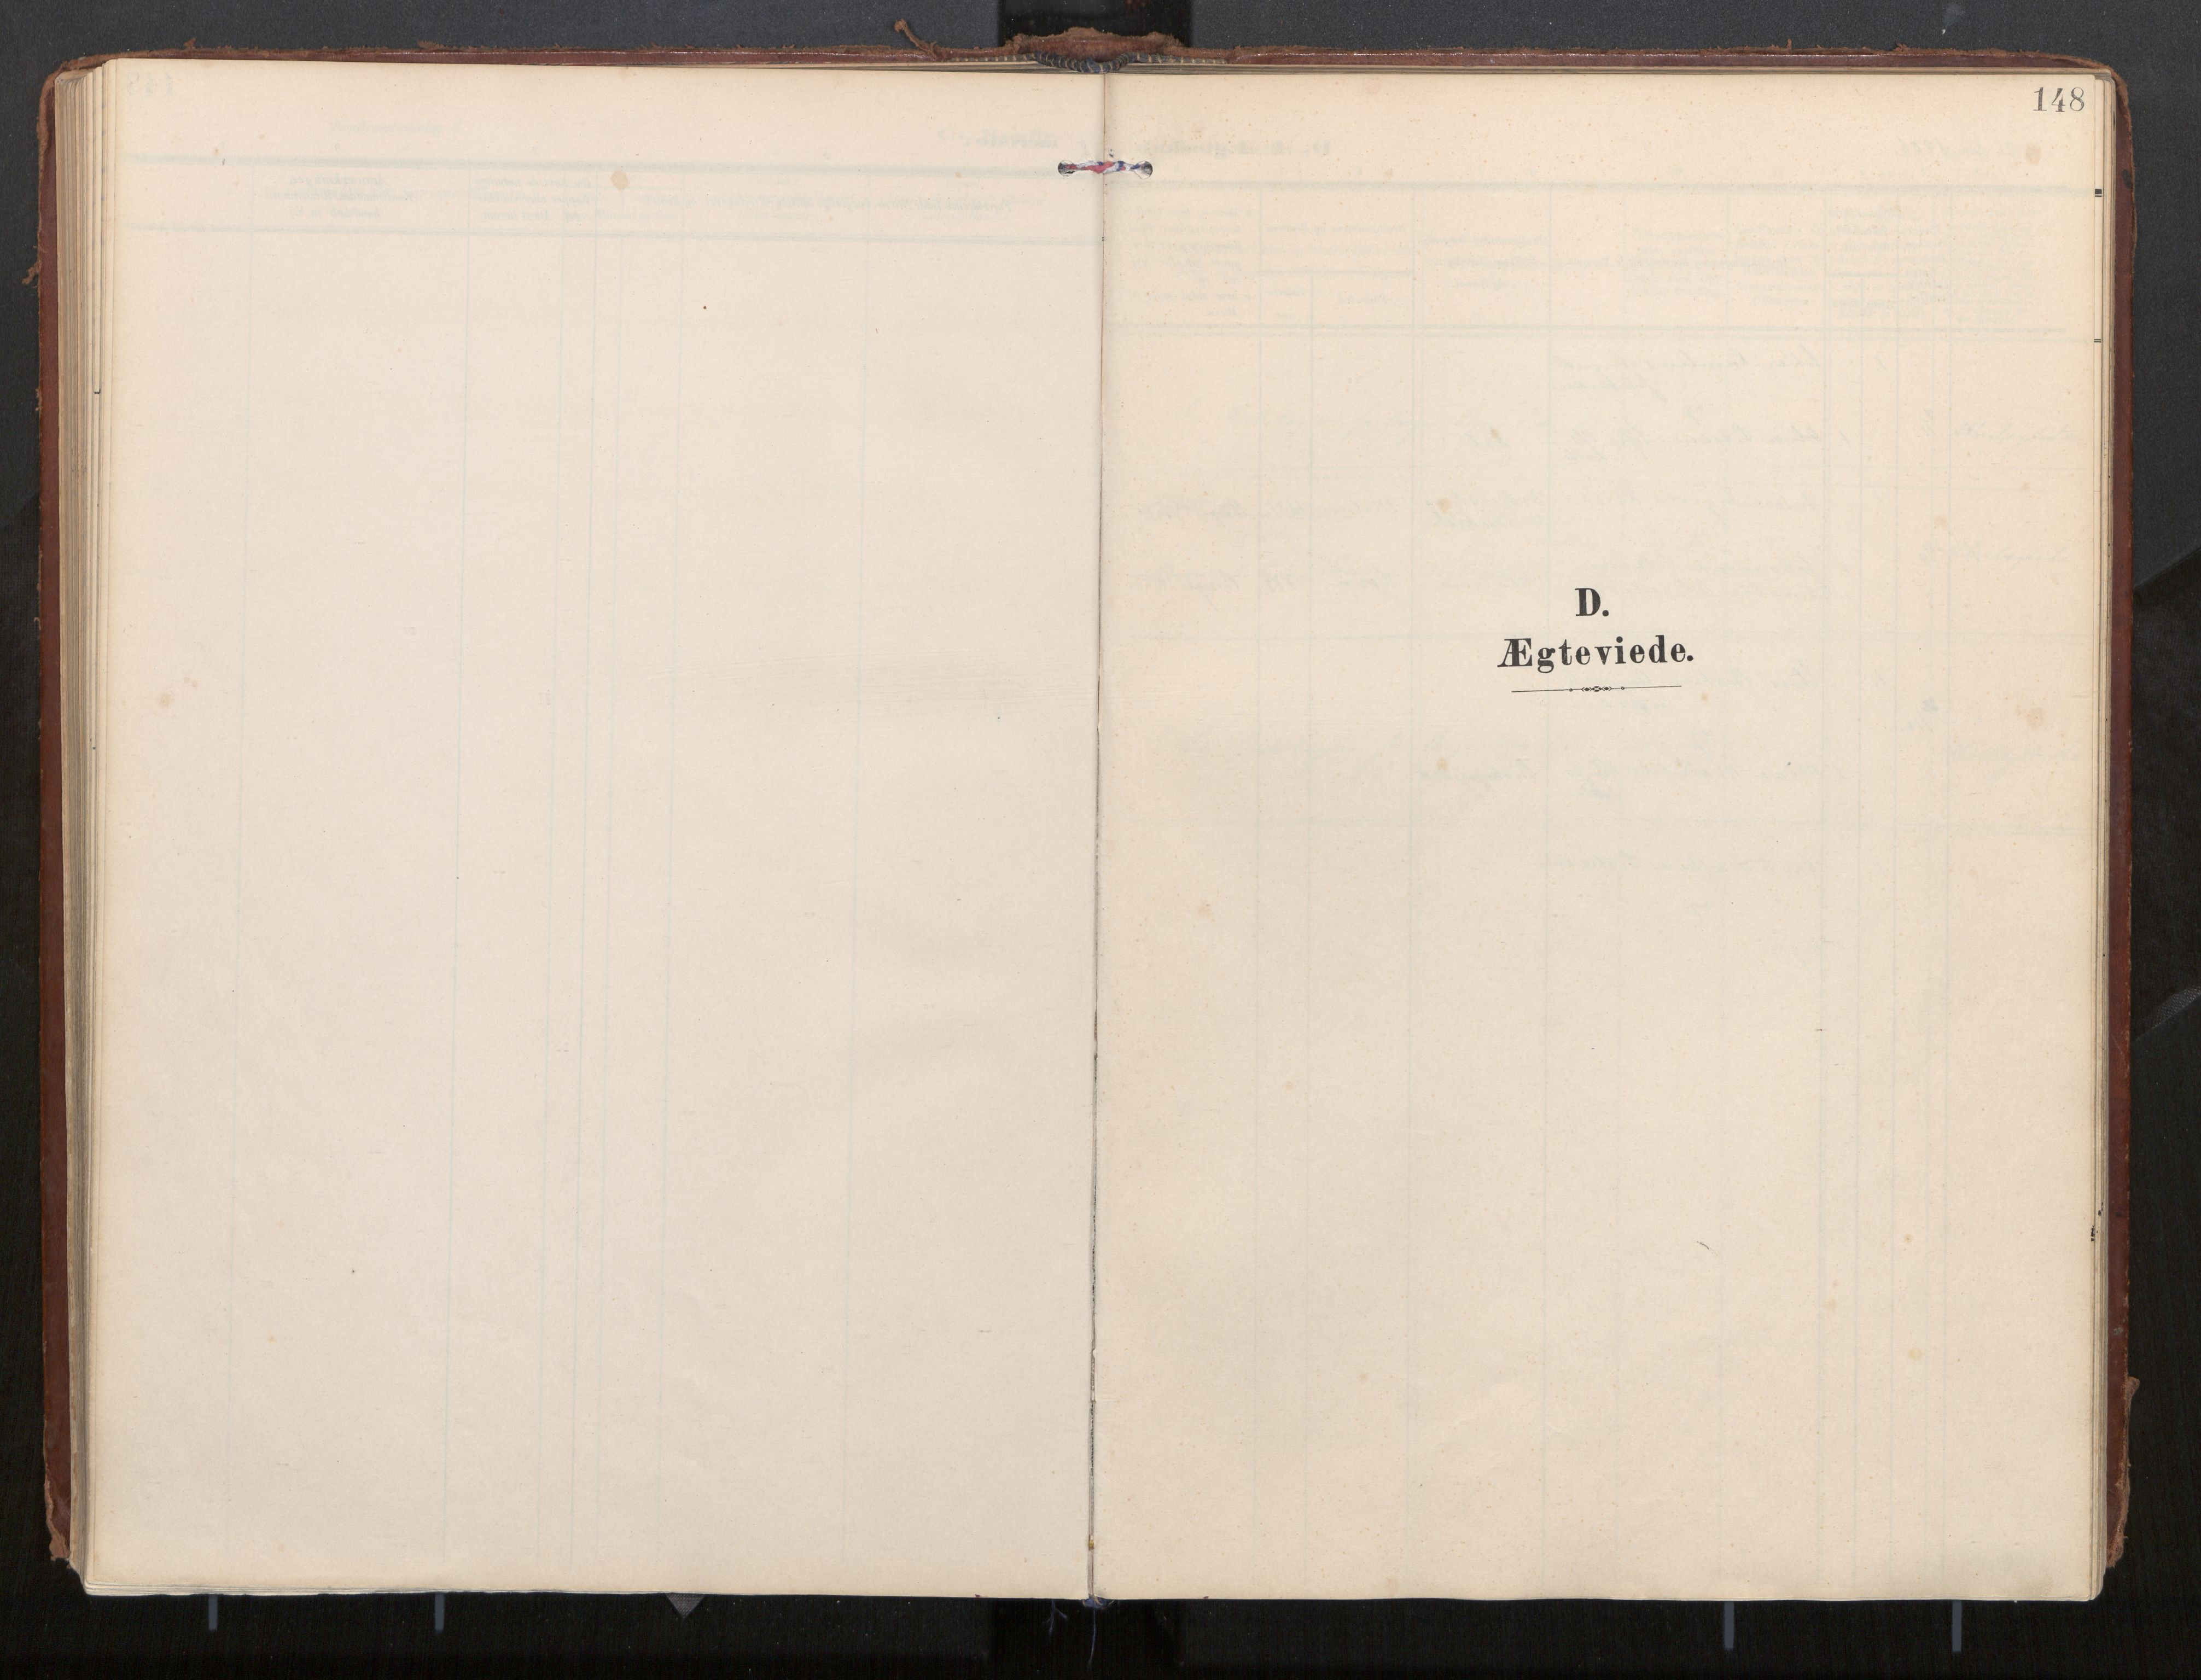 SAT, Ministerialprotokoller, klokkerbøker og fødselsregistre - Nordland, 884/L1194: Ministerialbok nr. 884A02, 1906-1937, s. 147